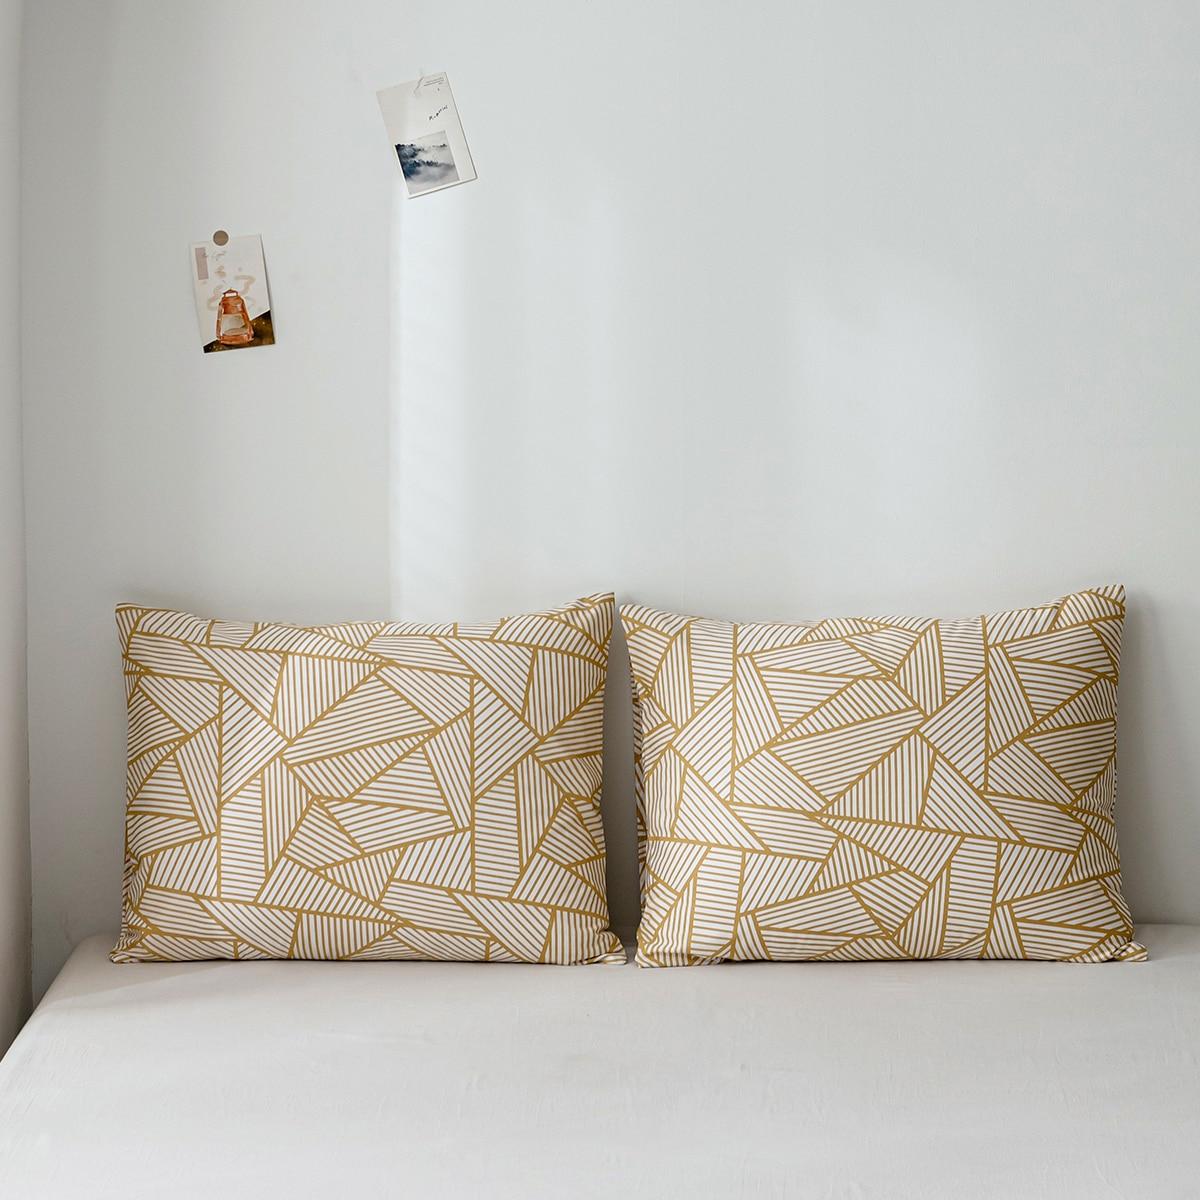 1Pair Geometric Pattern Pillowcase Without Filler